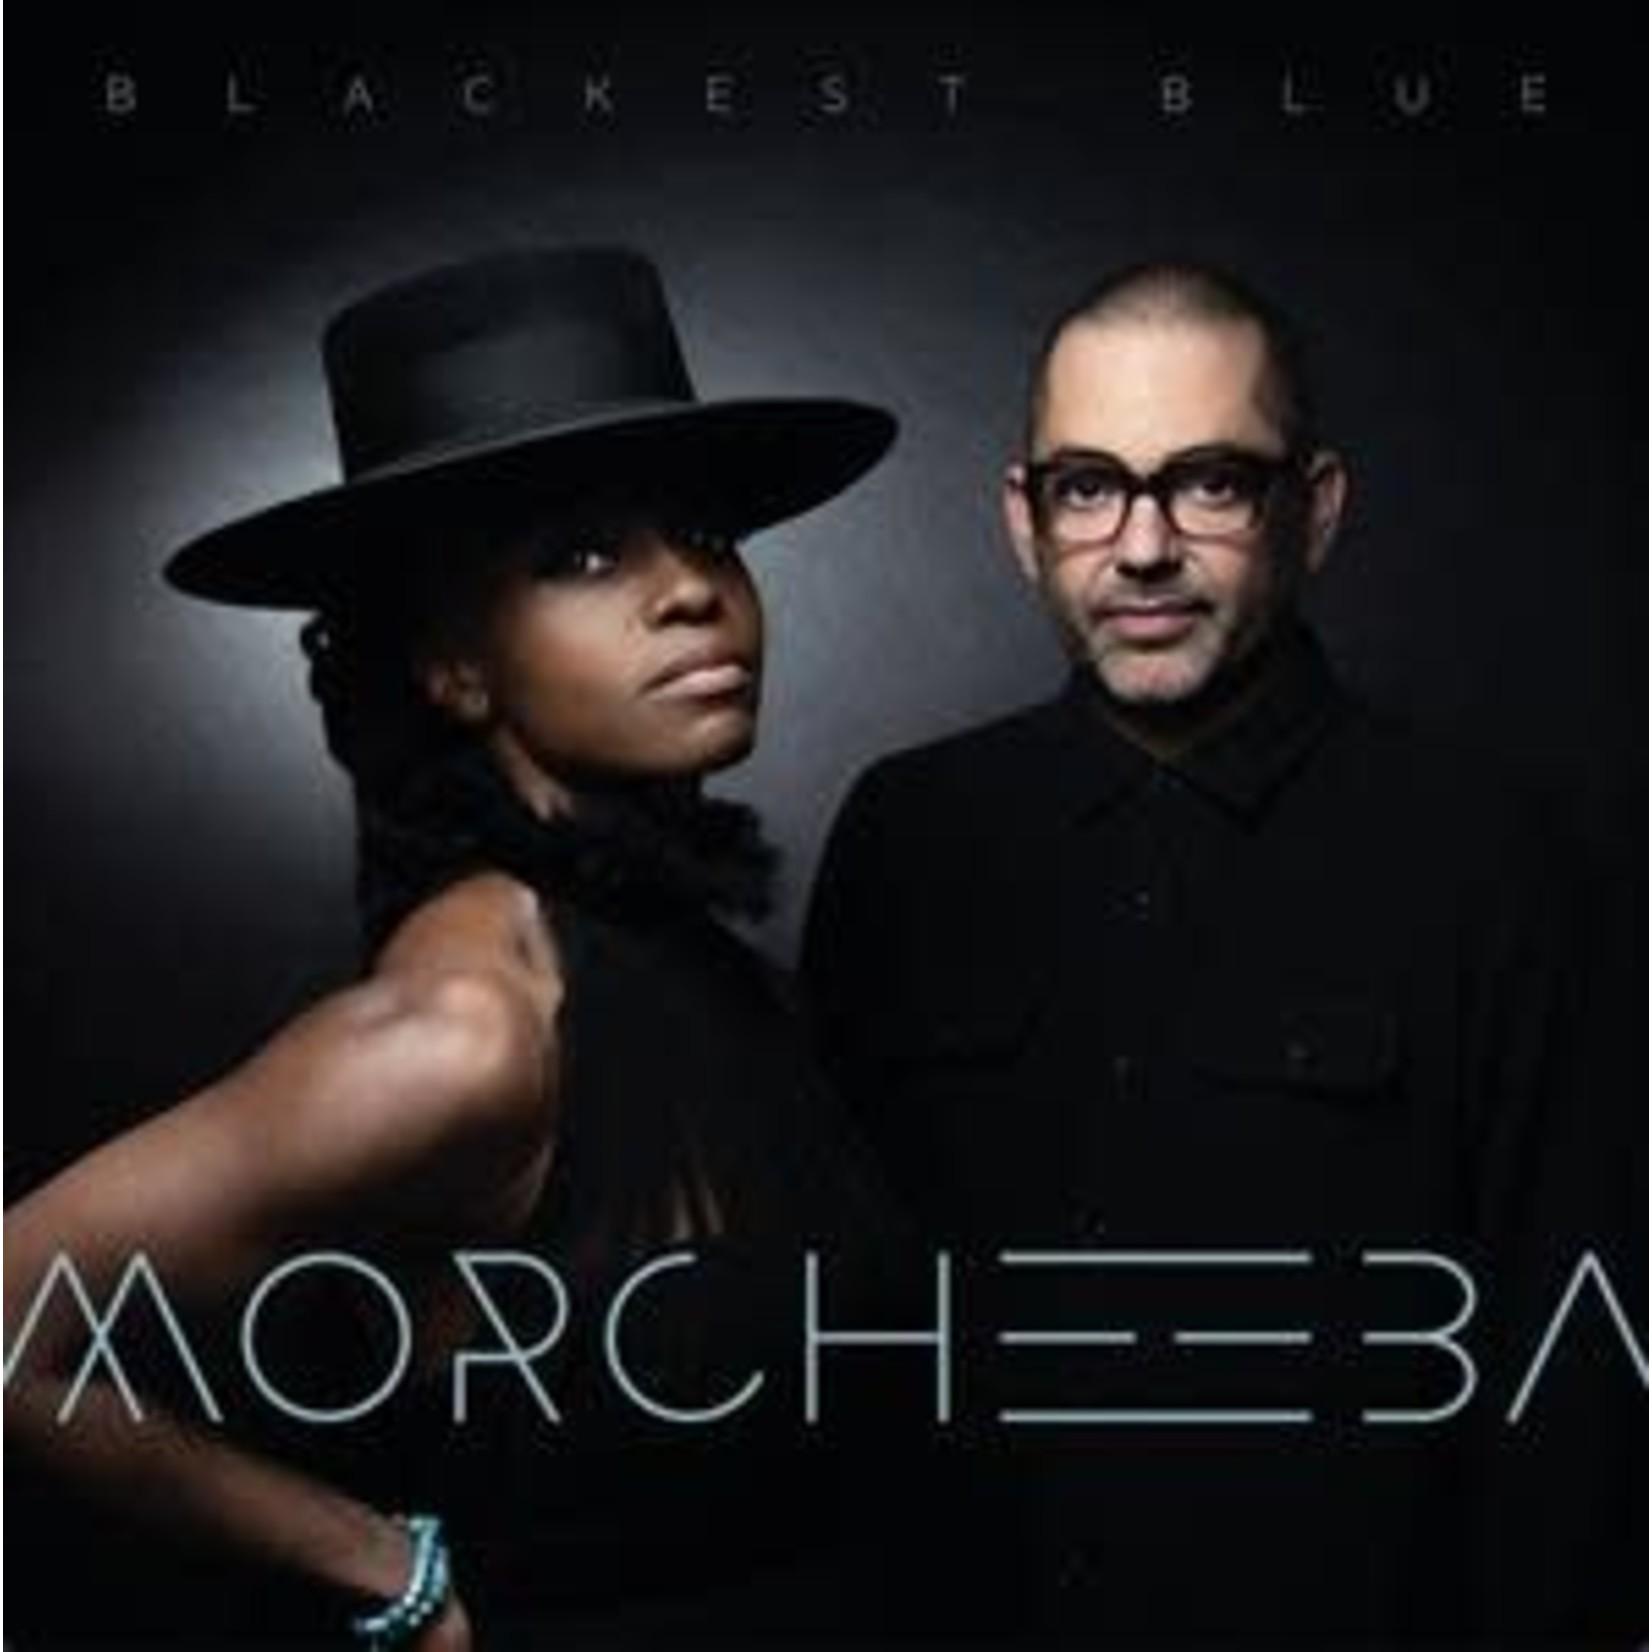 MORCHEEBA - BLACKEST BLUE -COLOURED- (VINYL)